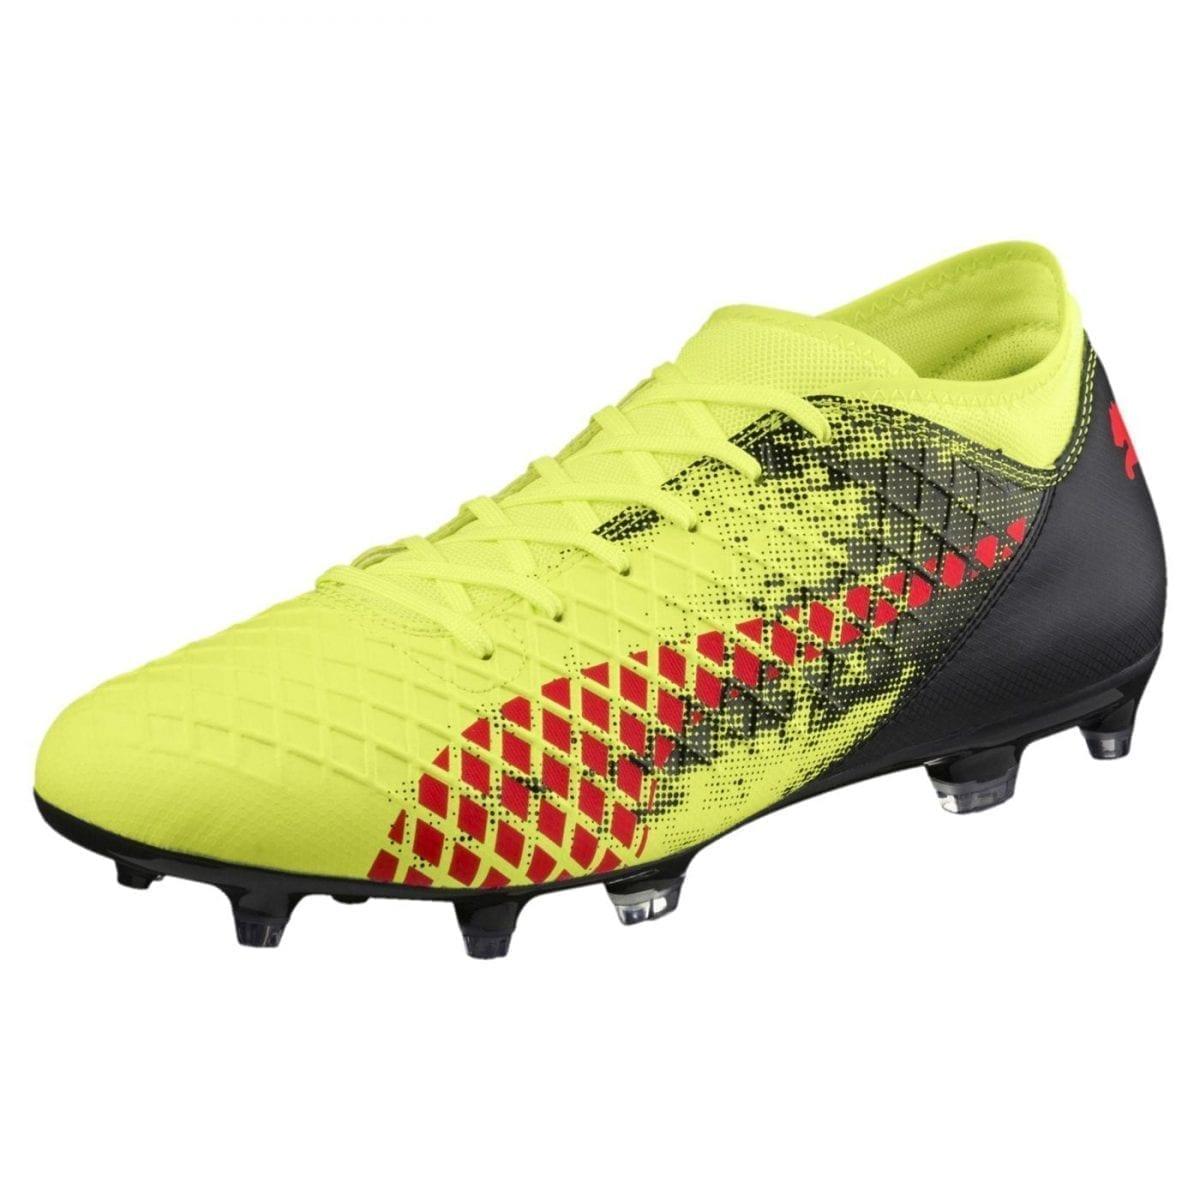 Puma Football Shoes Price